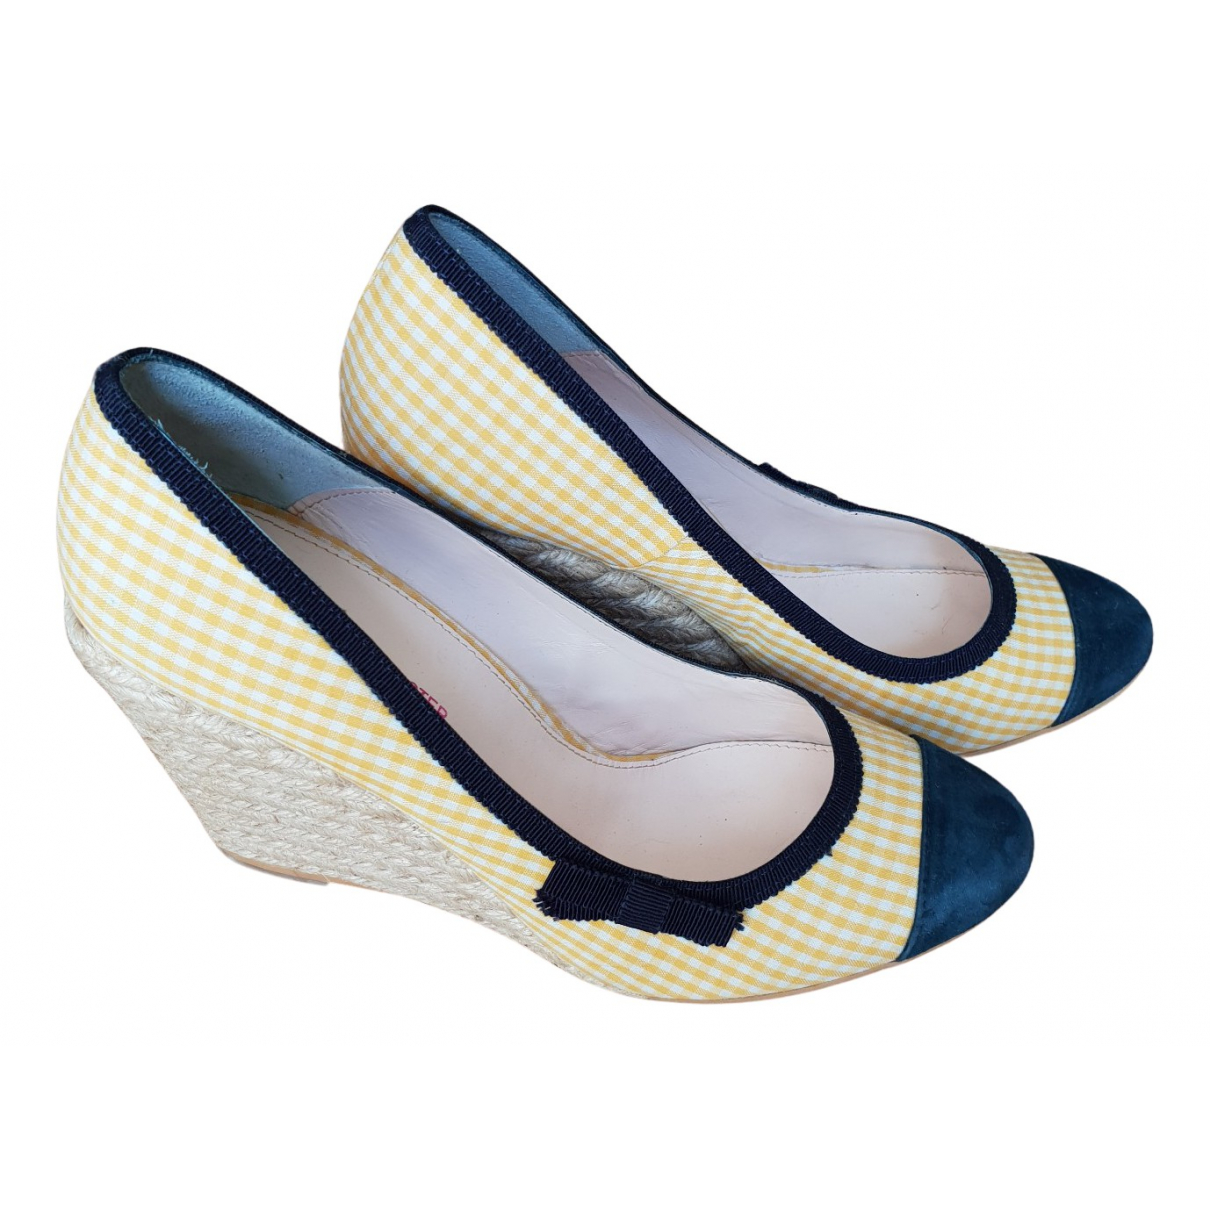 Paul & Joe Sister N Yellow Cloth Sandals for Women 40 EU